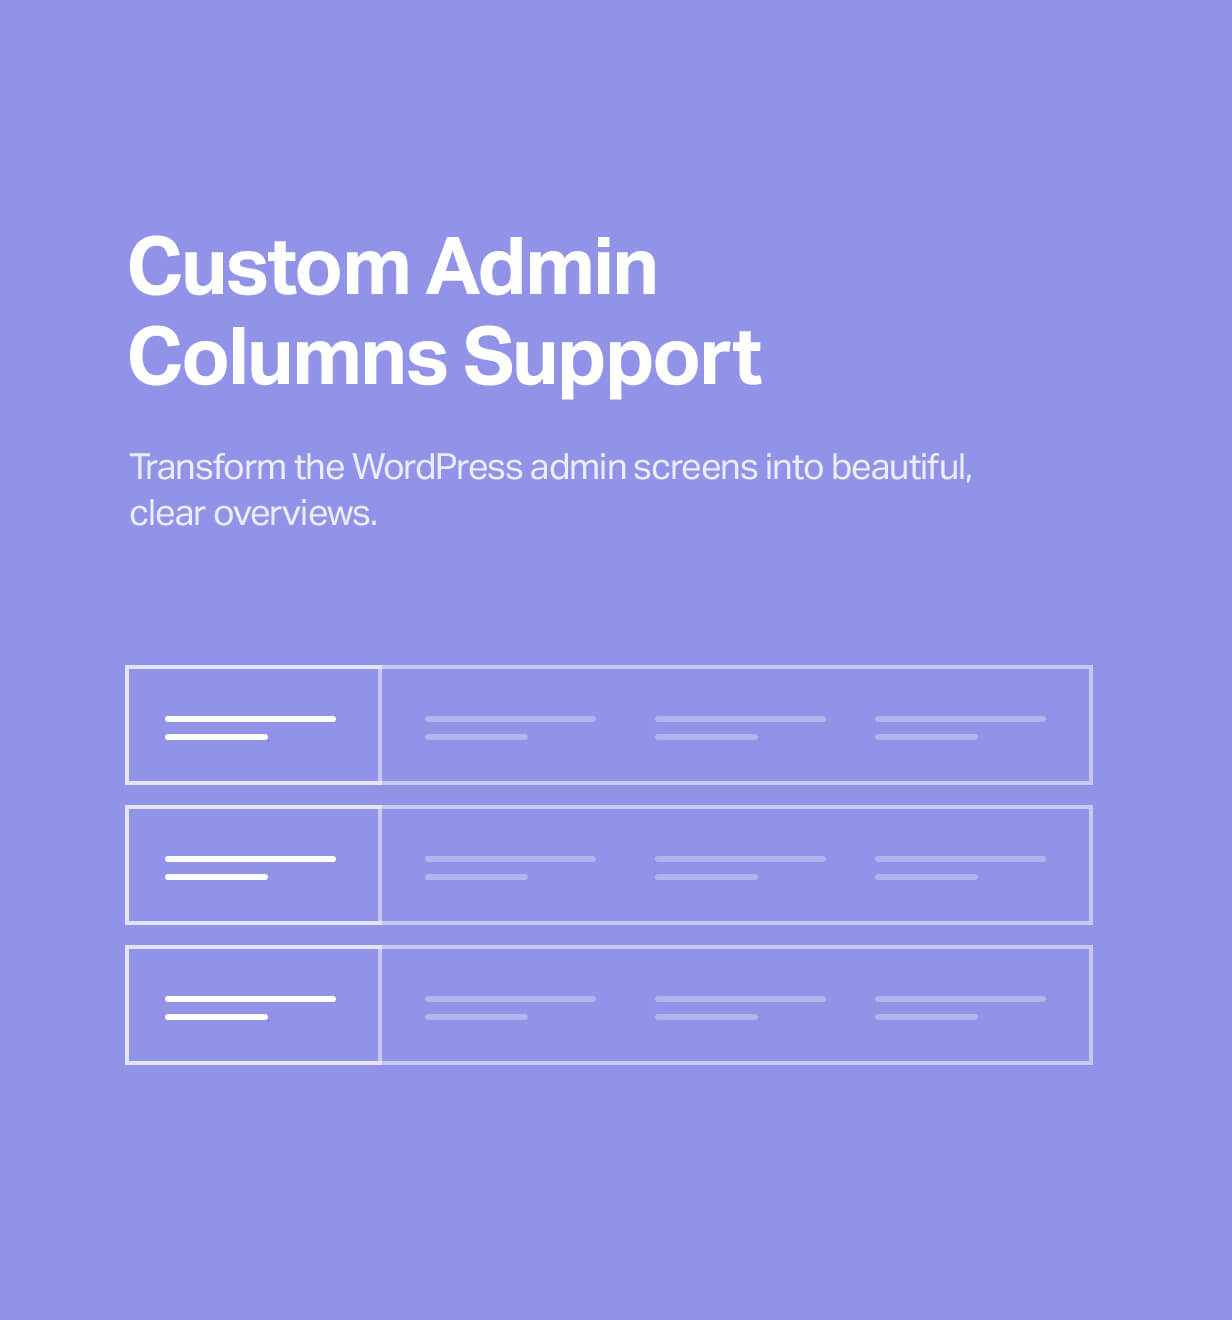 Custom admin columns support